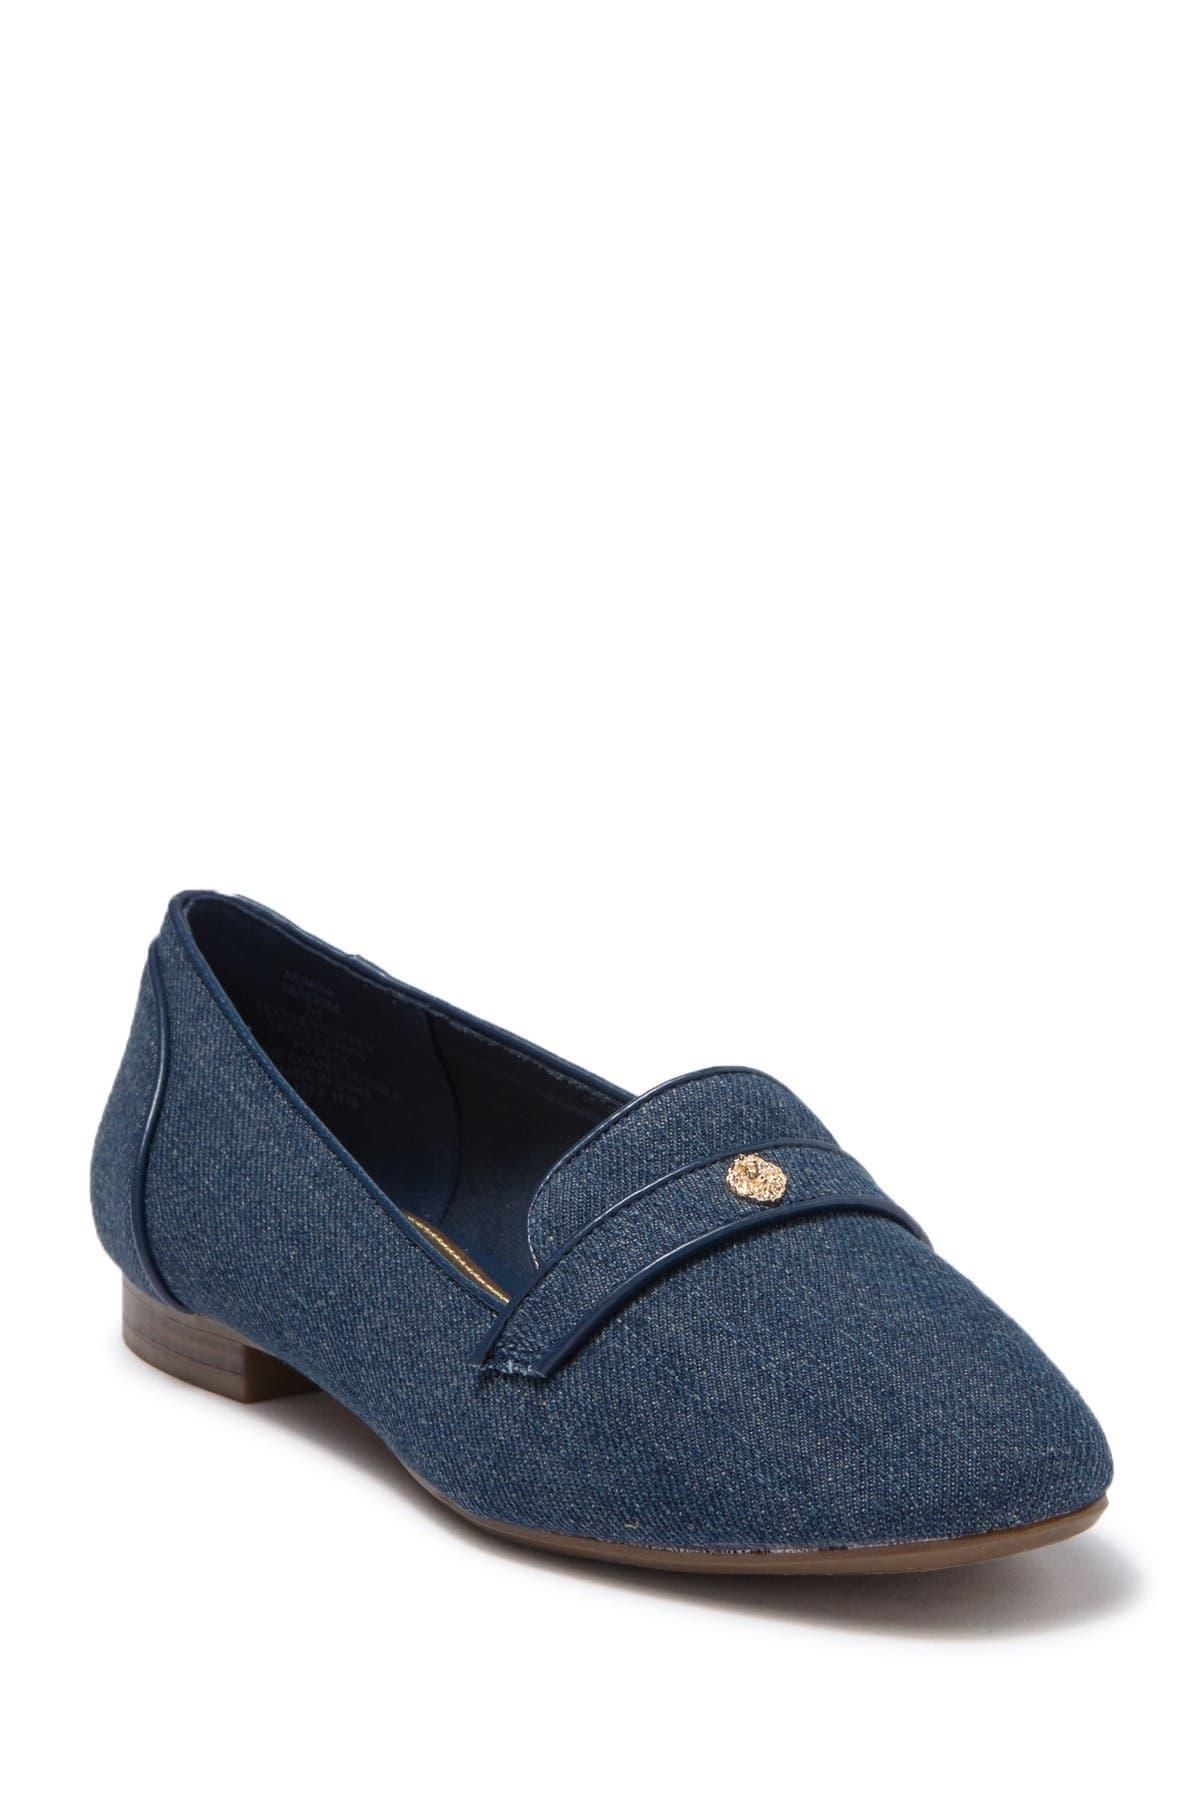 Anne Klein Women's Shoes   Nordstrom Rack